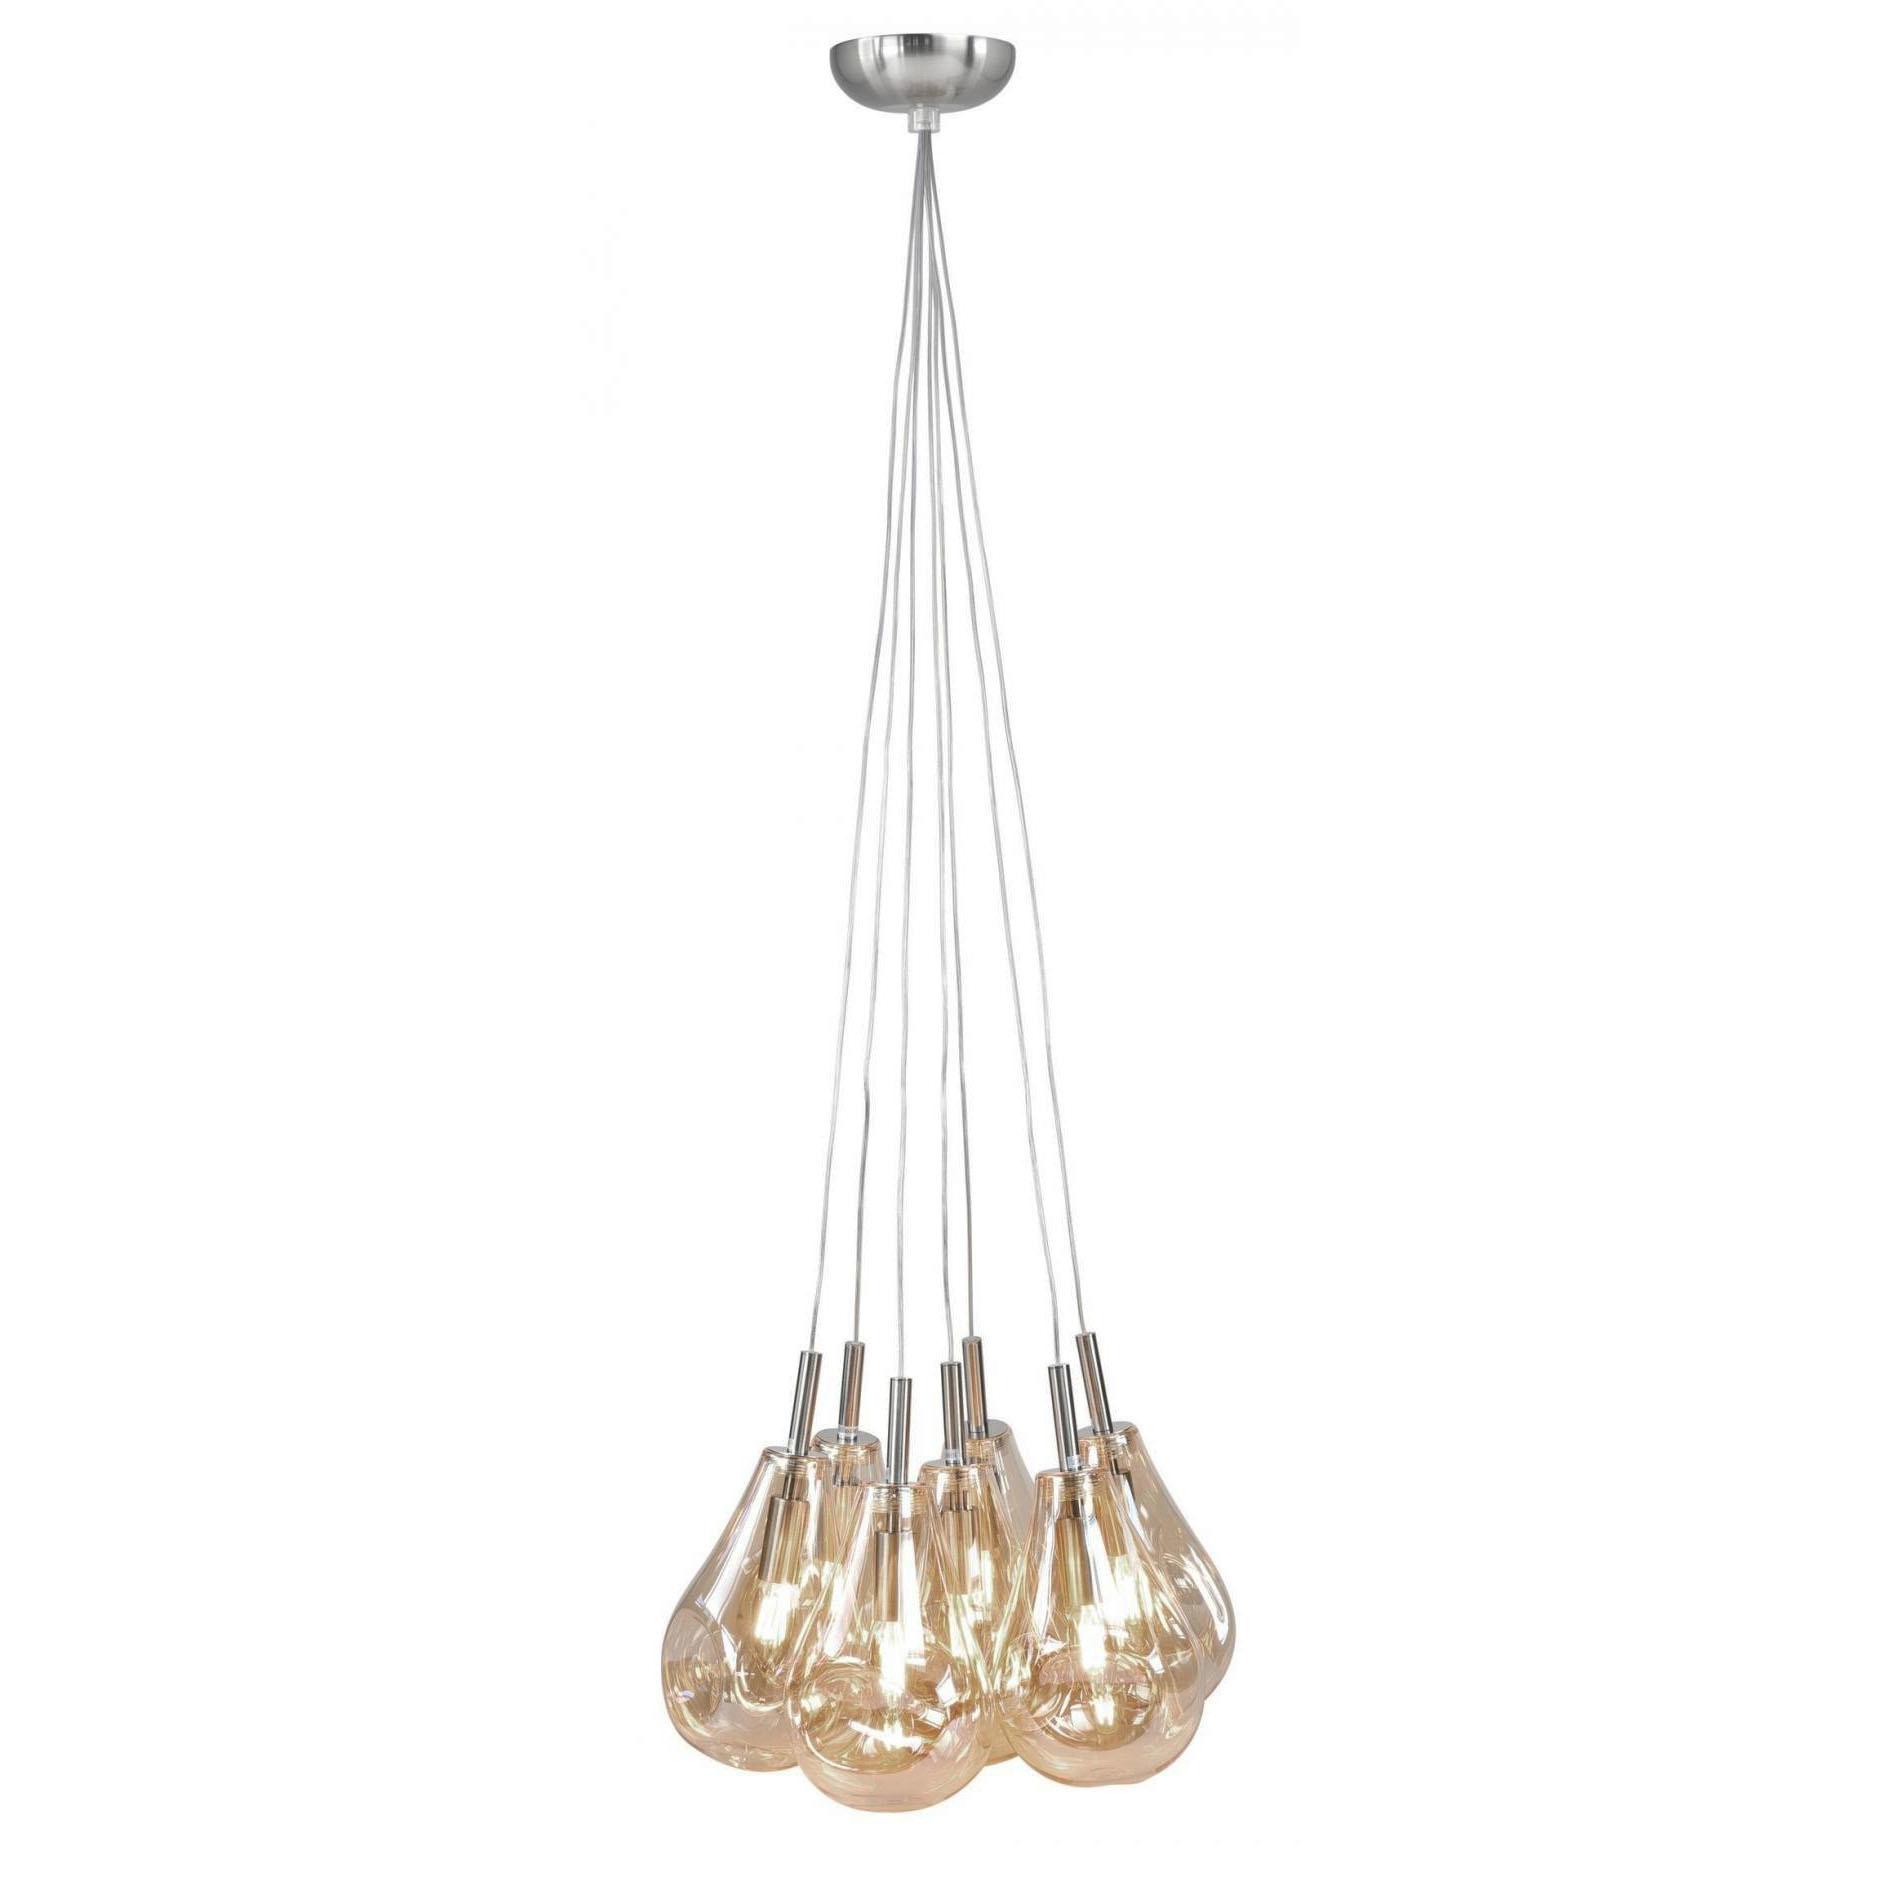 Highlight Hanglamp Granata 7 lichts Ø 40 cm amber glas